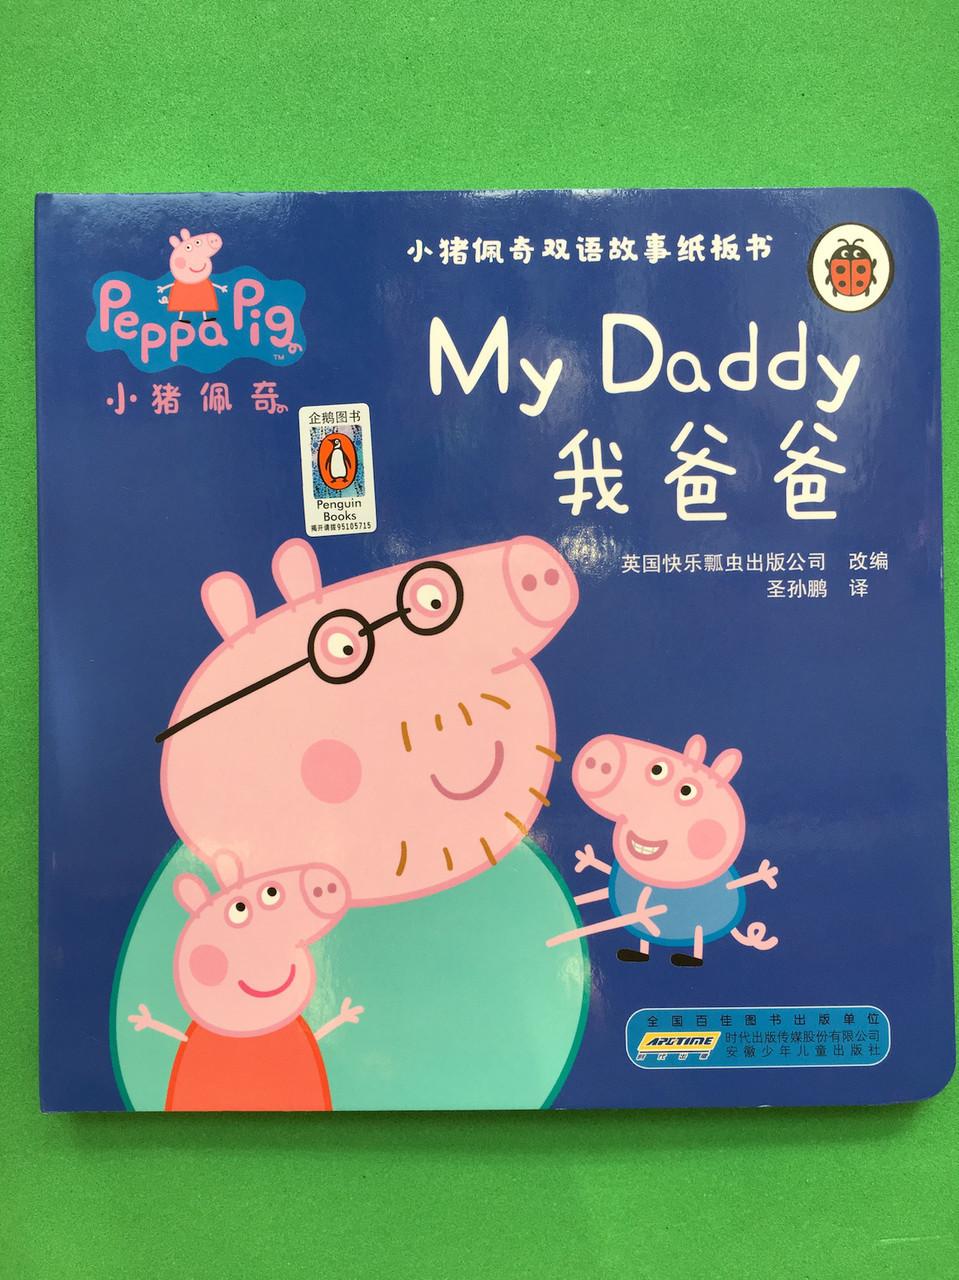 Peppa Pig. My Daddy. Chinese + English. Свинка Пеппа. Мой папа. На китайском и английском языках.